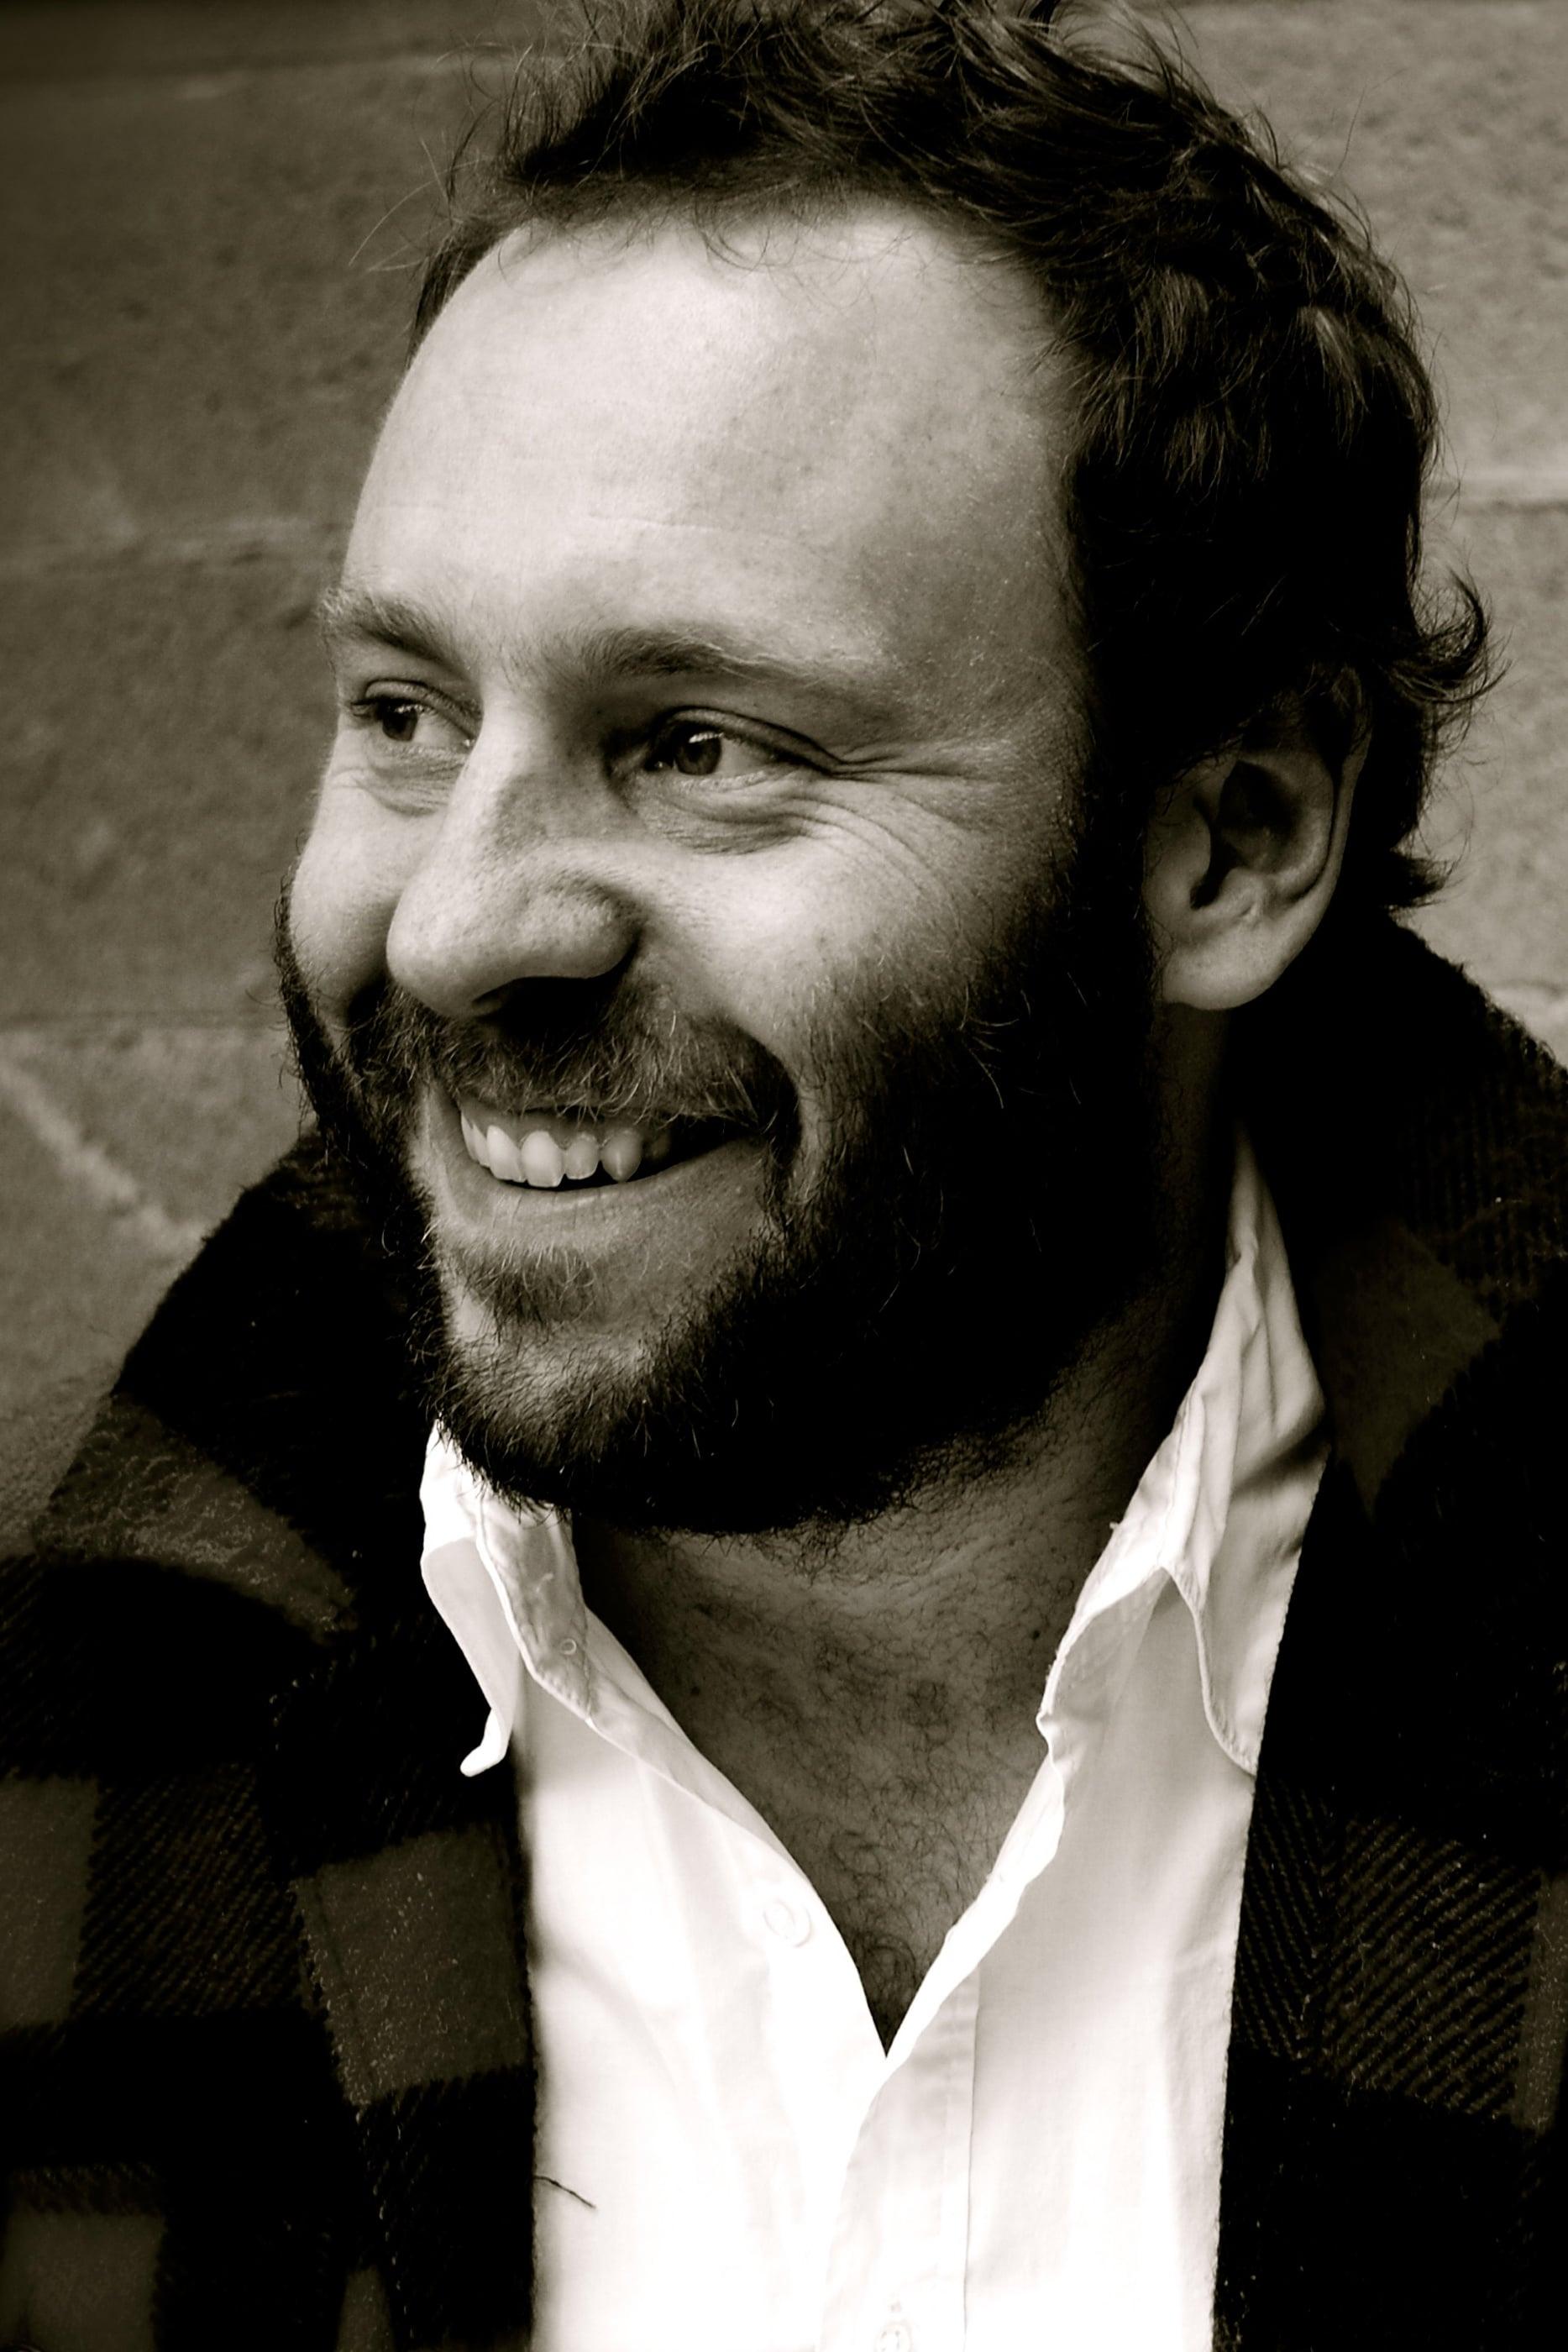 Jean-Sébastien Lavoie